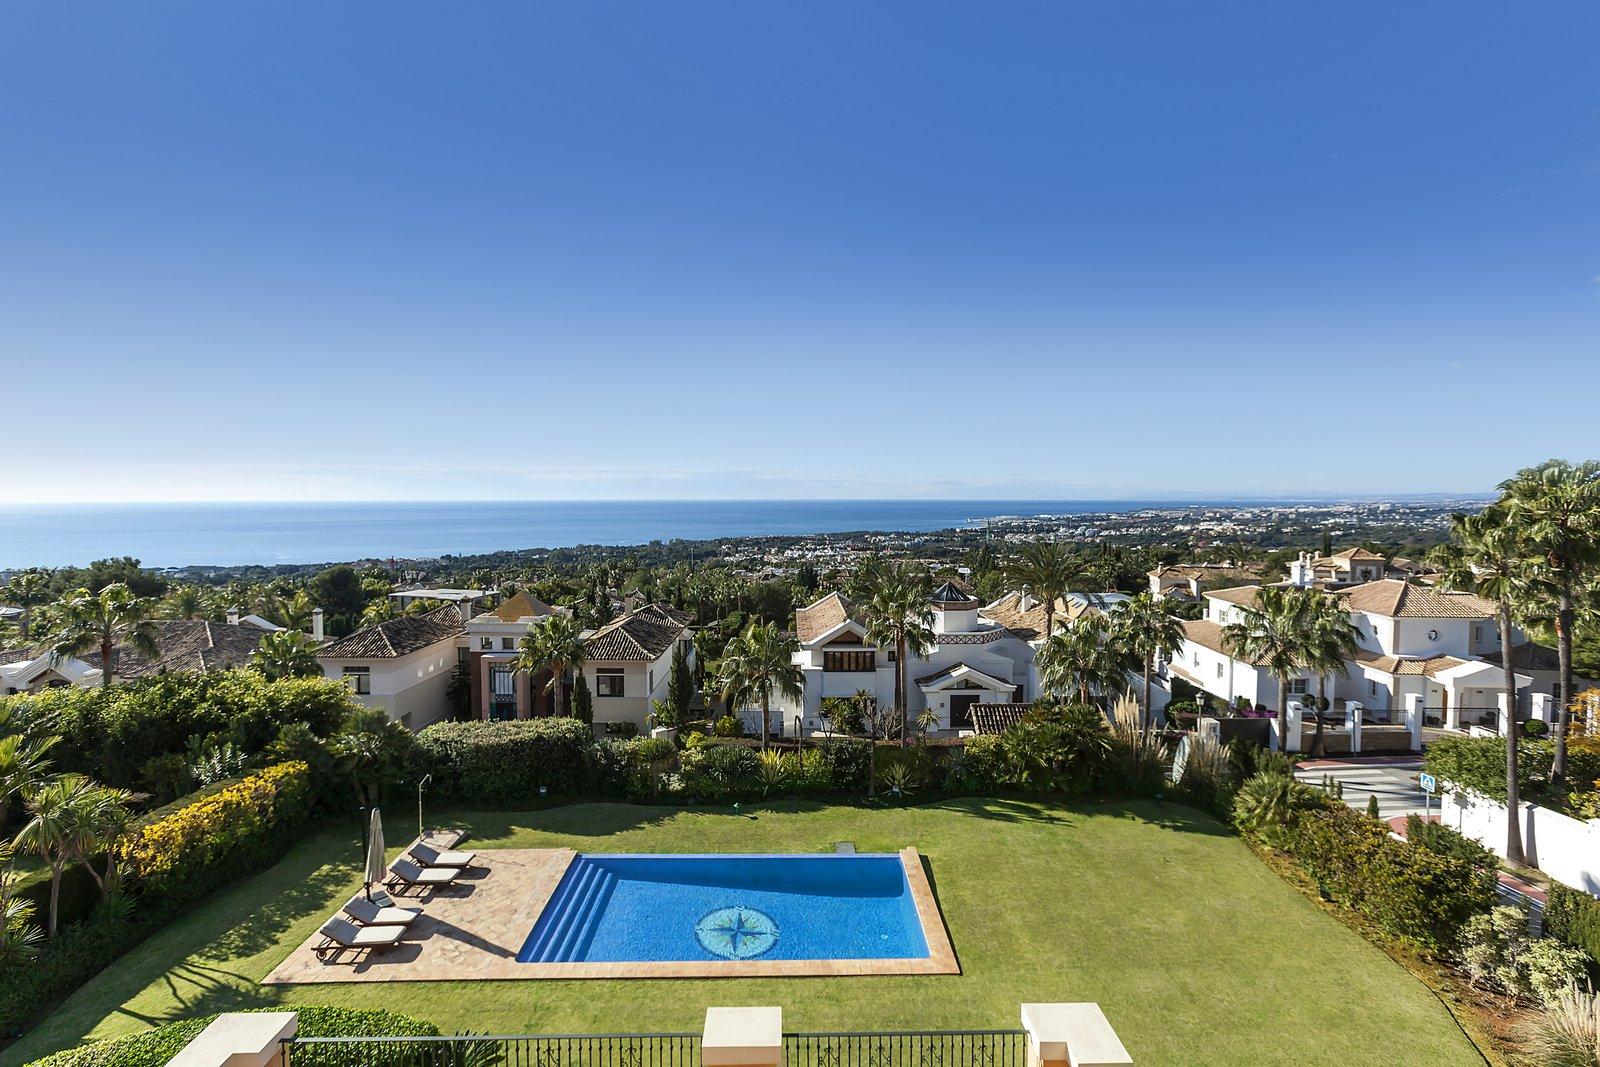 Casa Lujo Marbella Sierra Blanca